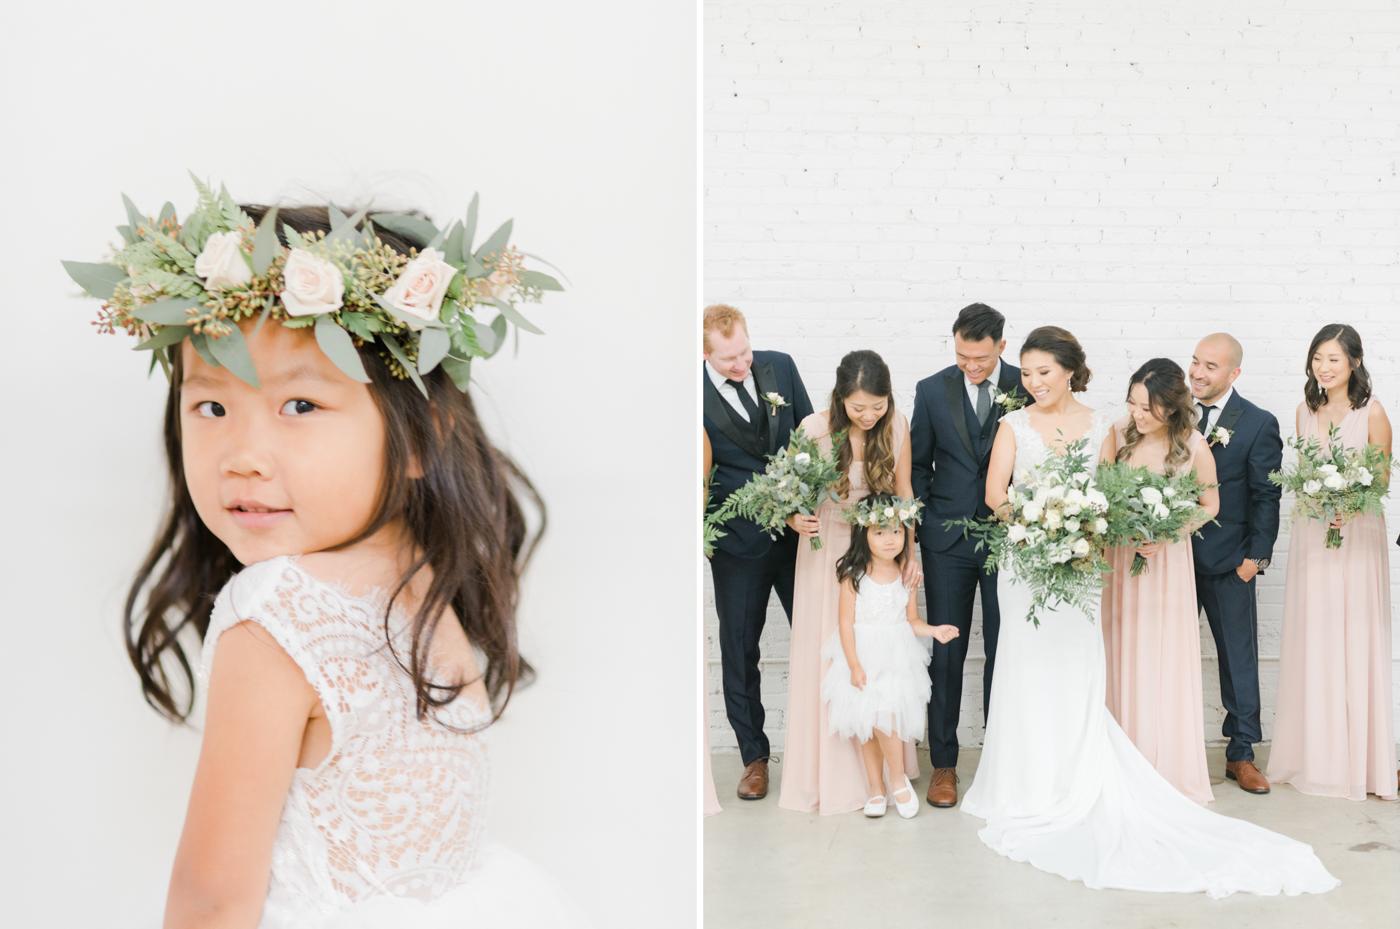 Modern_Wedding_HNYPT_Honeypot_LA_Photographer_Los_Angeles-13.jpg